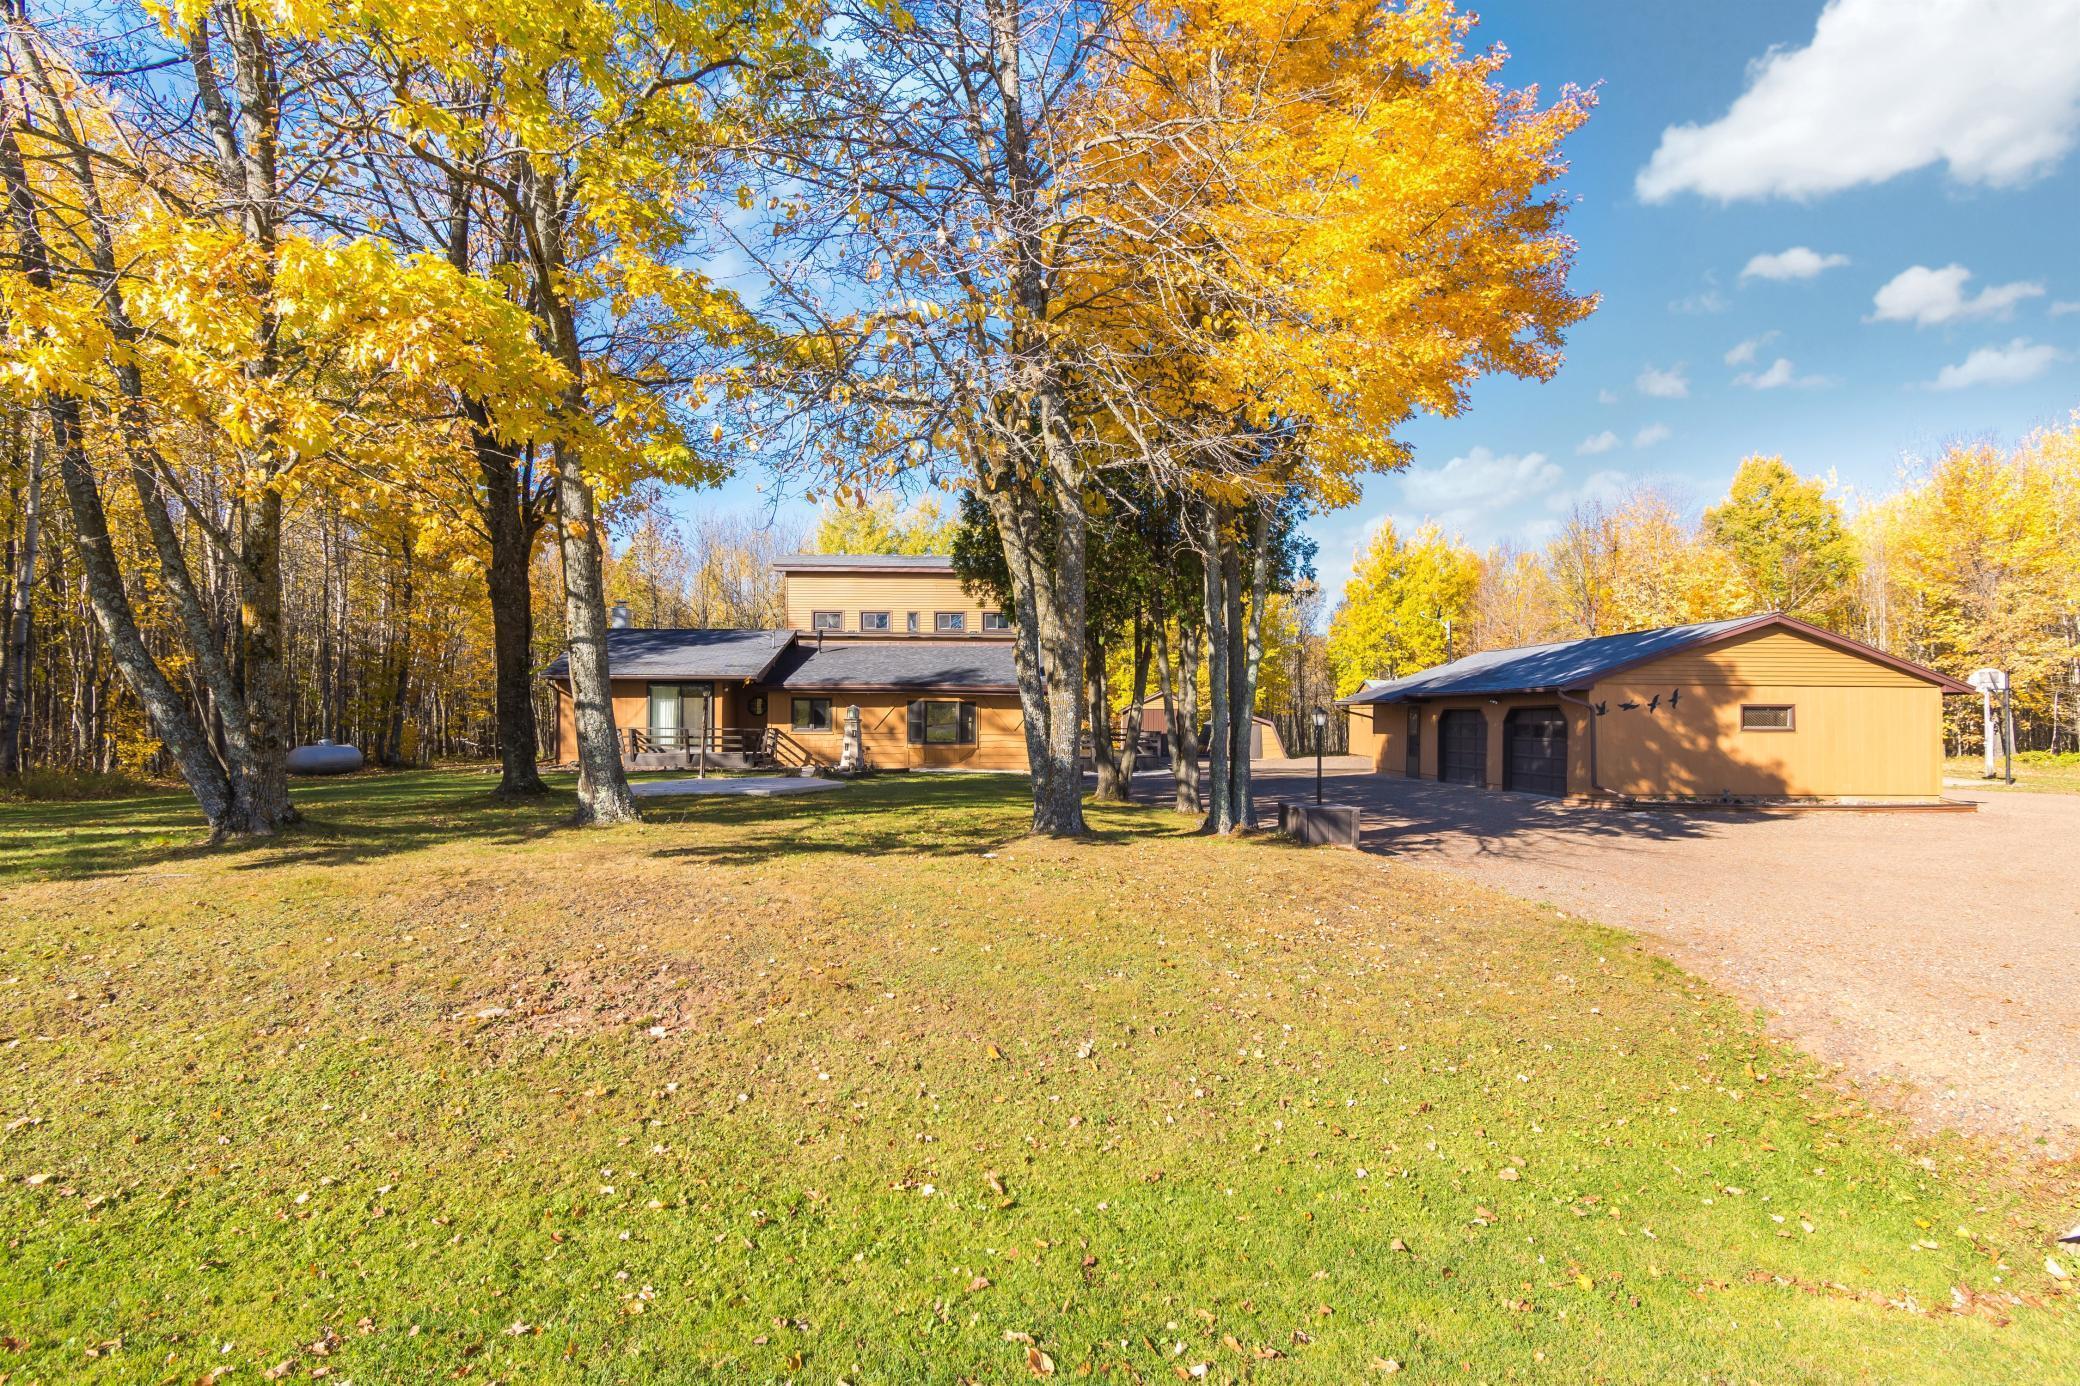 2285 County Road 7 Property Photo - Mahtowa, MN real estate listing